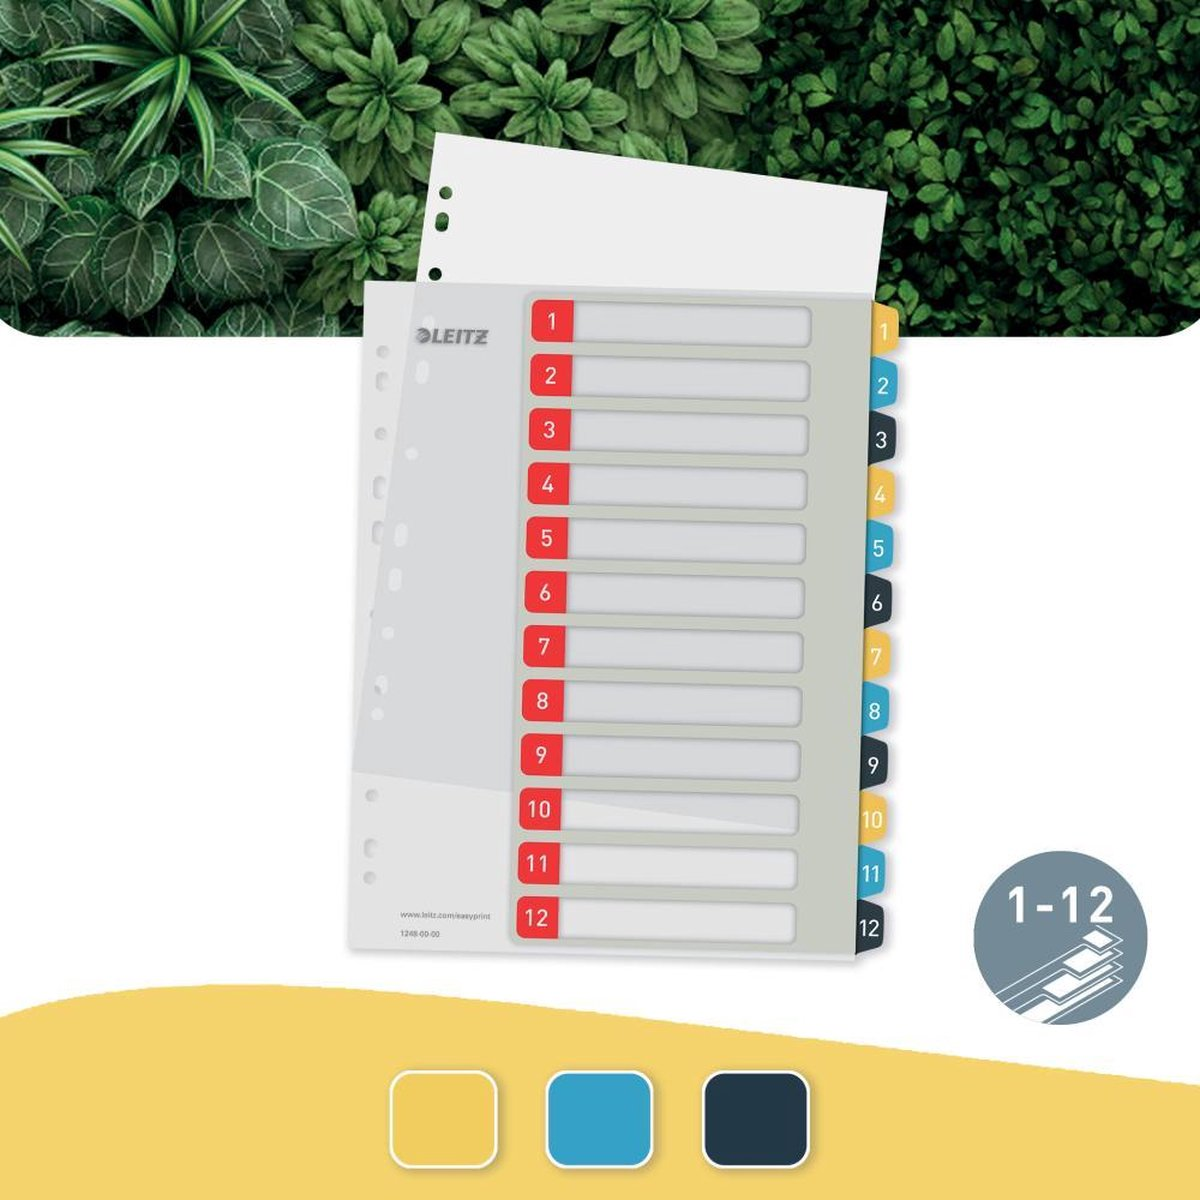 Leitz Cosy Printbare PP Tabbladen - 1-12 Numerieke Tabbladen - Tabbladen a4 - Tabbladen Voor Ordners